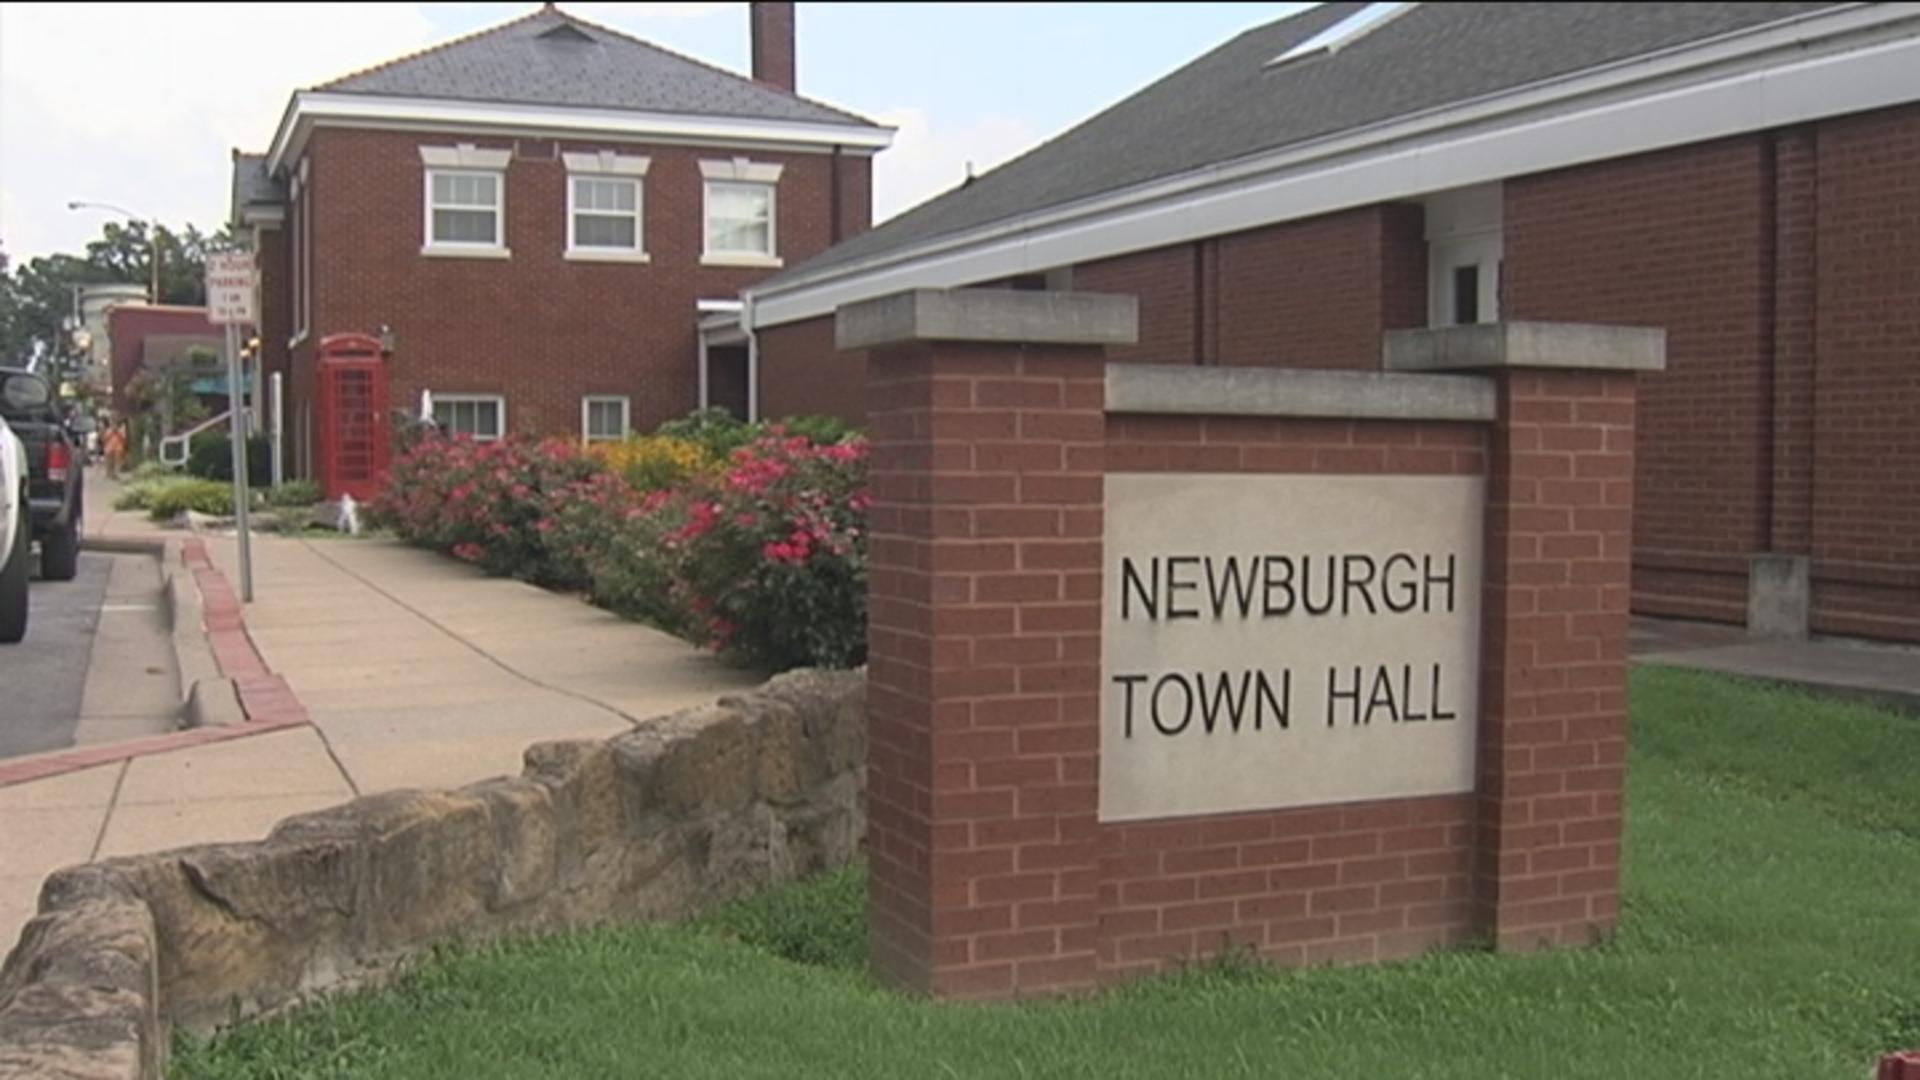 Newburgh Town Hall 2